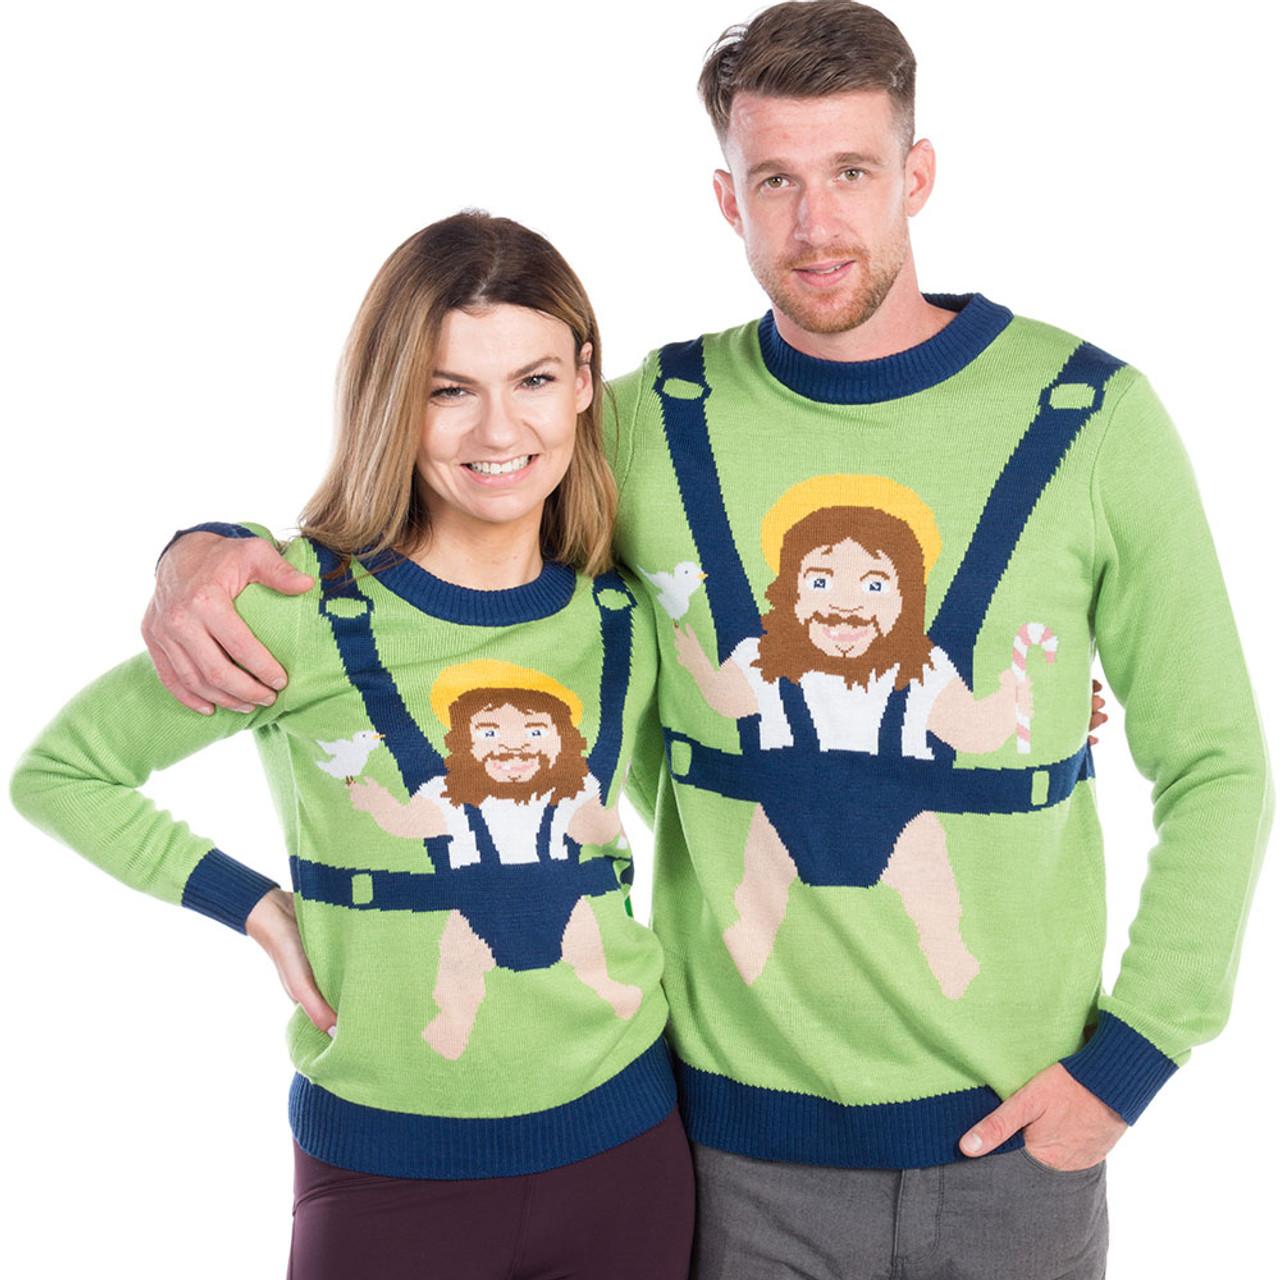 Baby Jesus Christmas Sweater Retrofestiveca